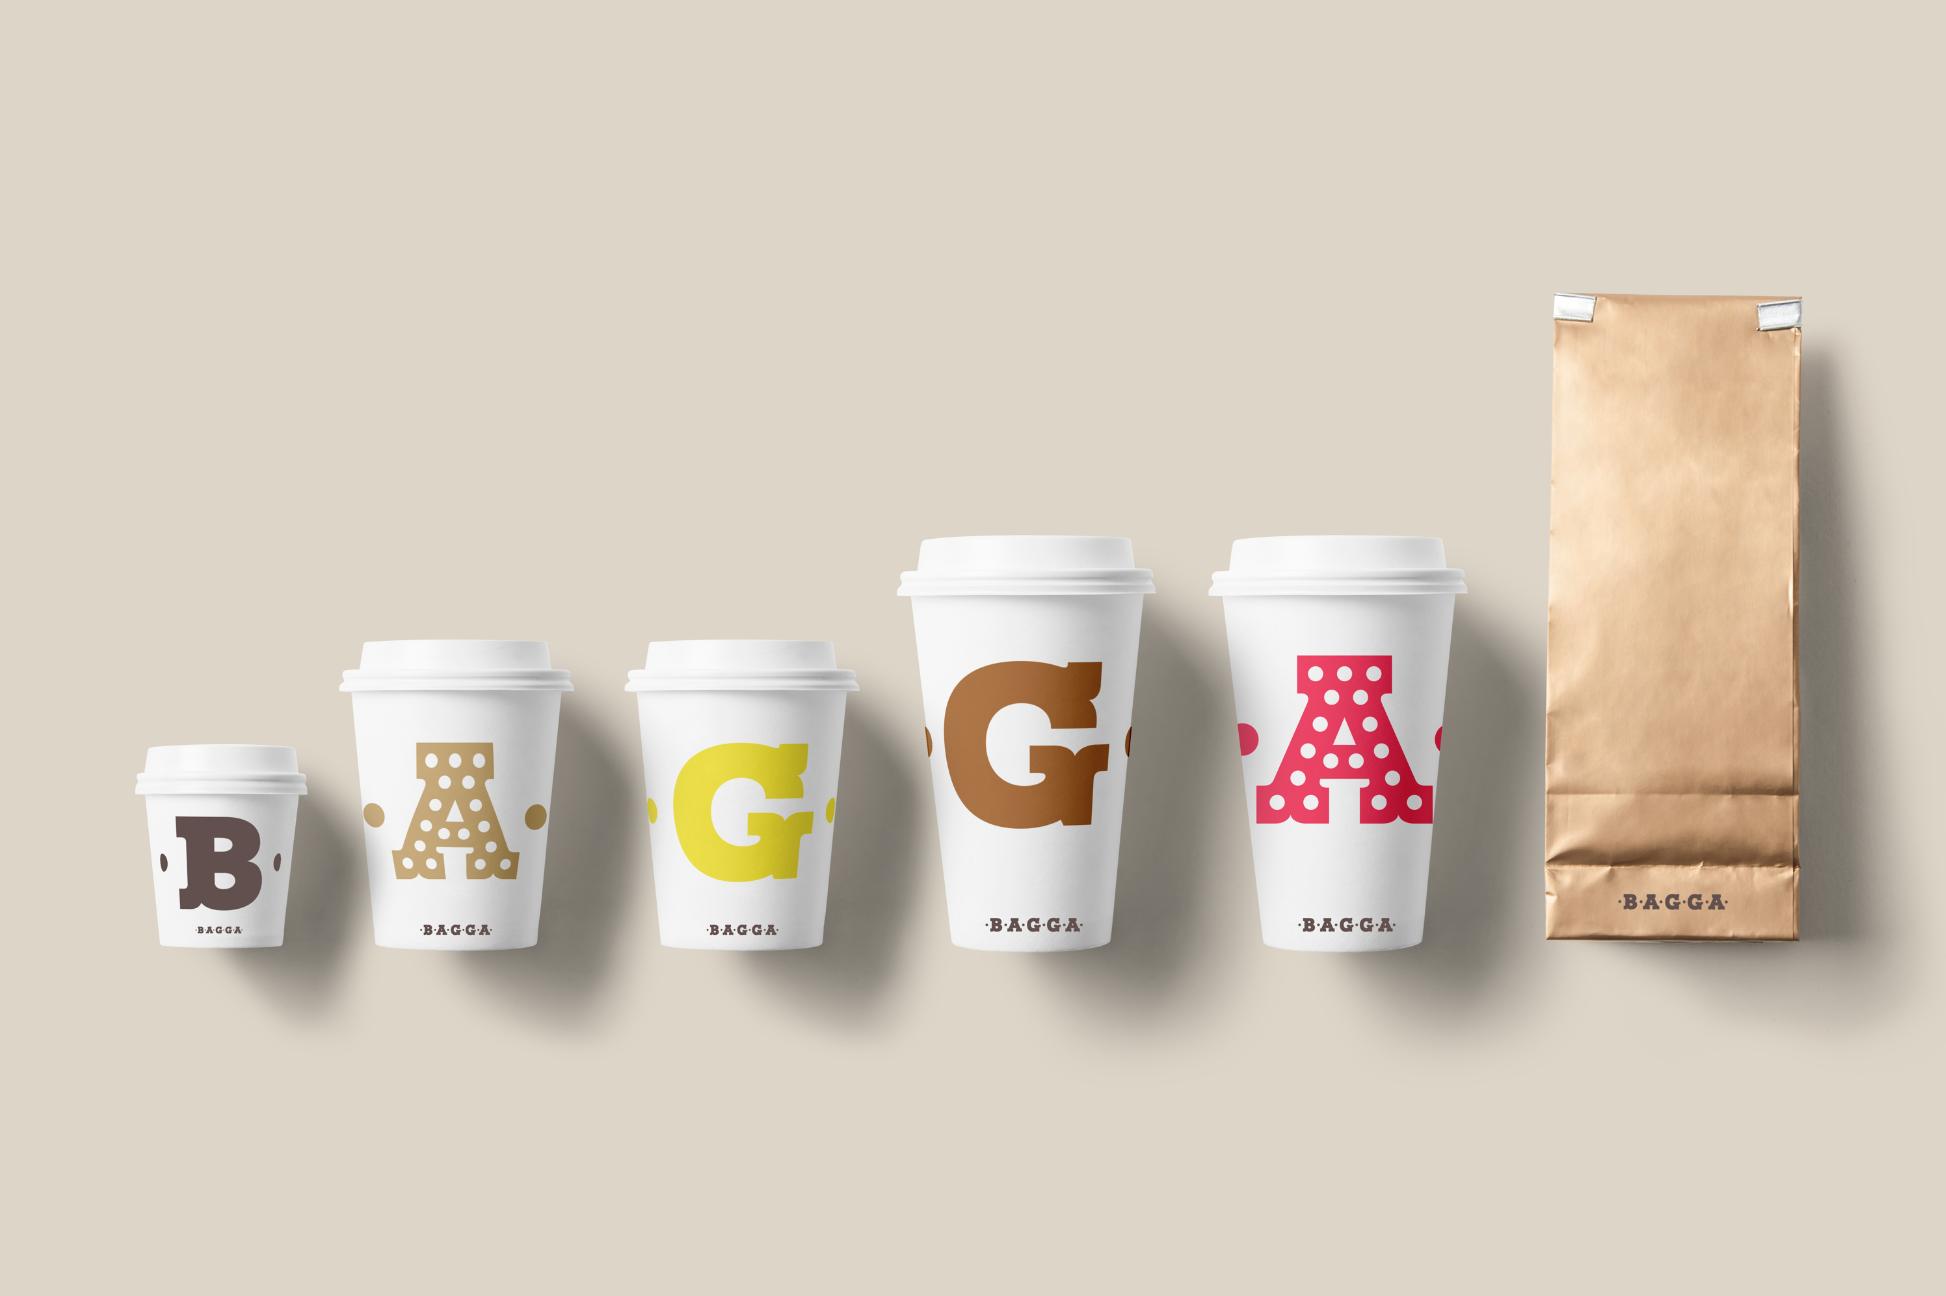 Bagga Caffe logo sonae